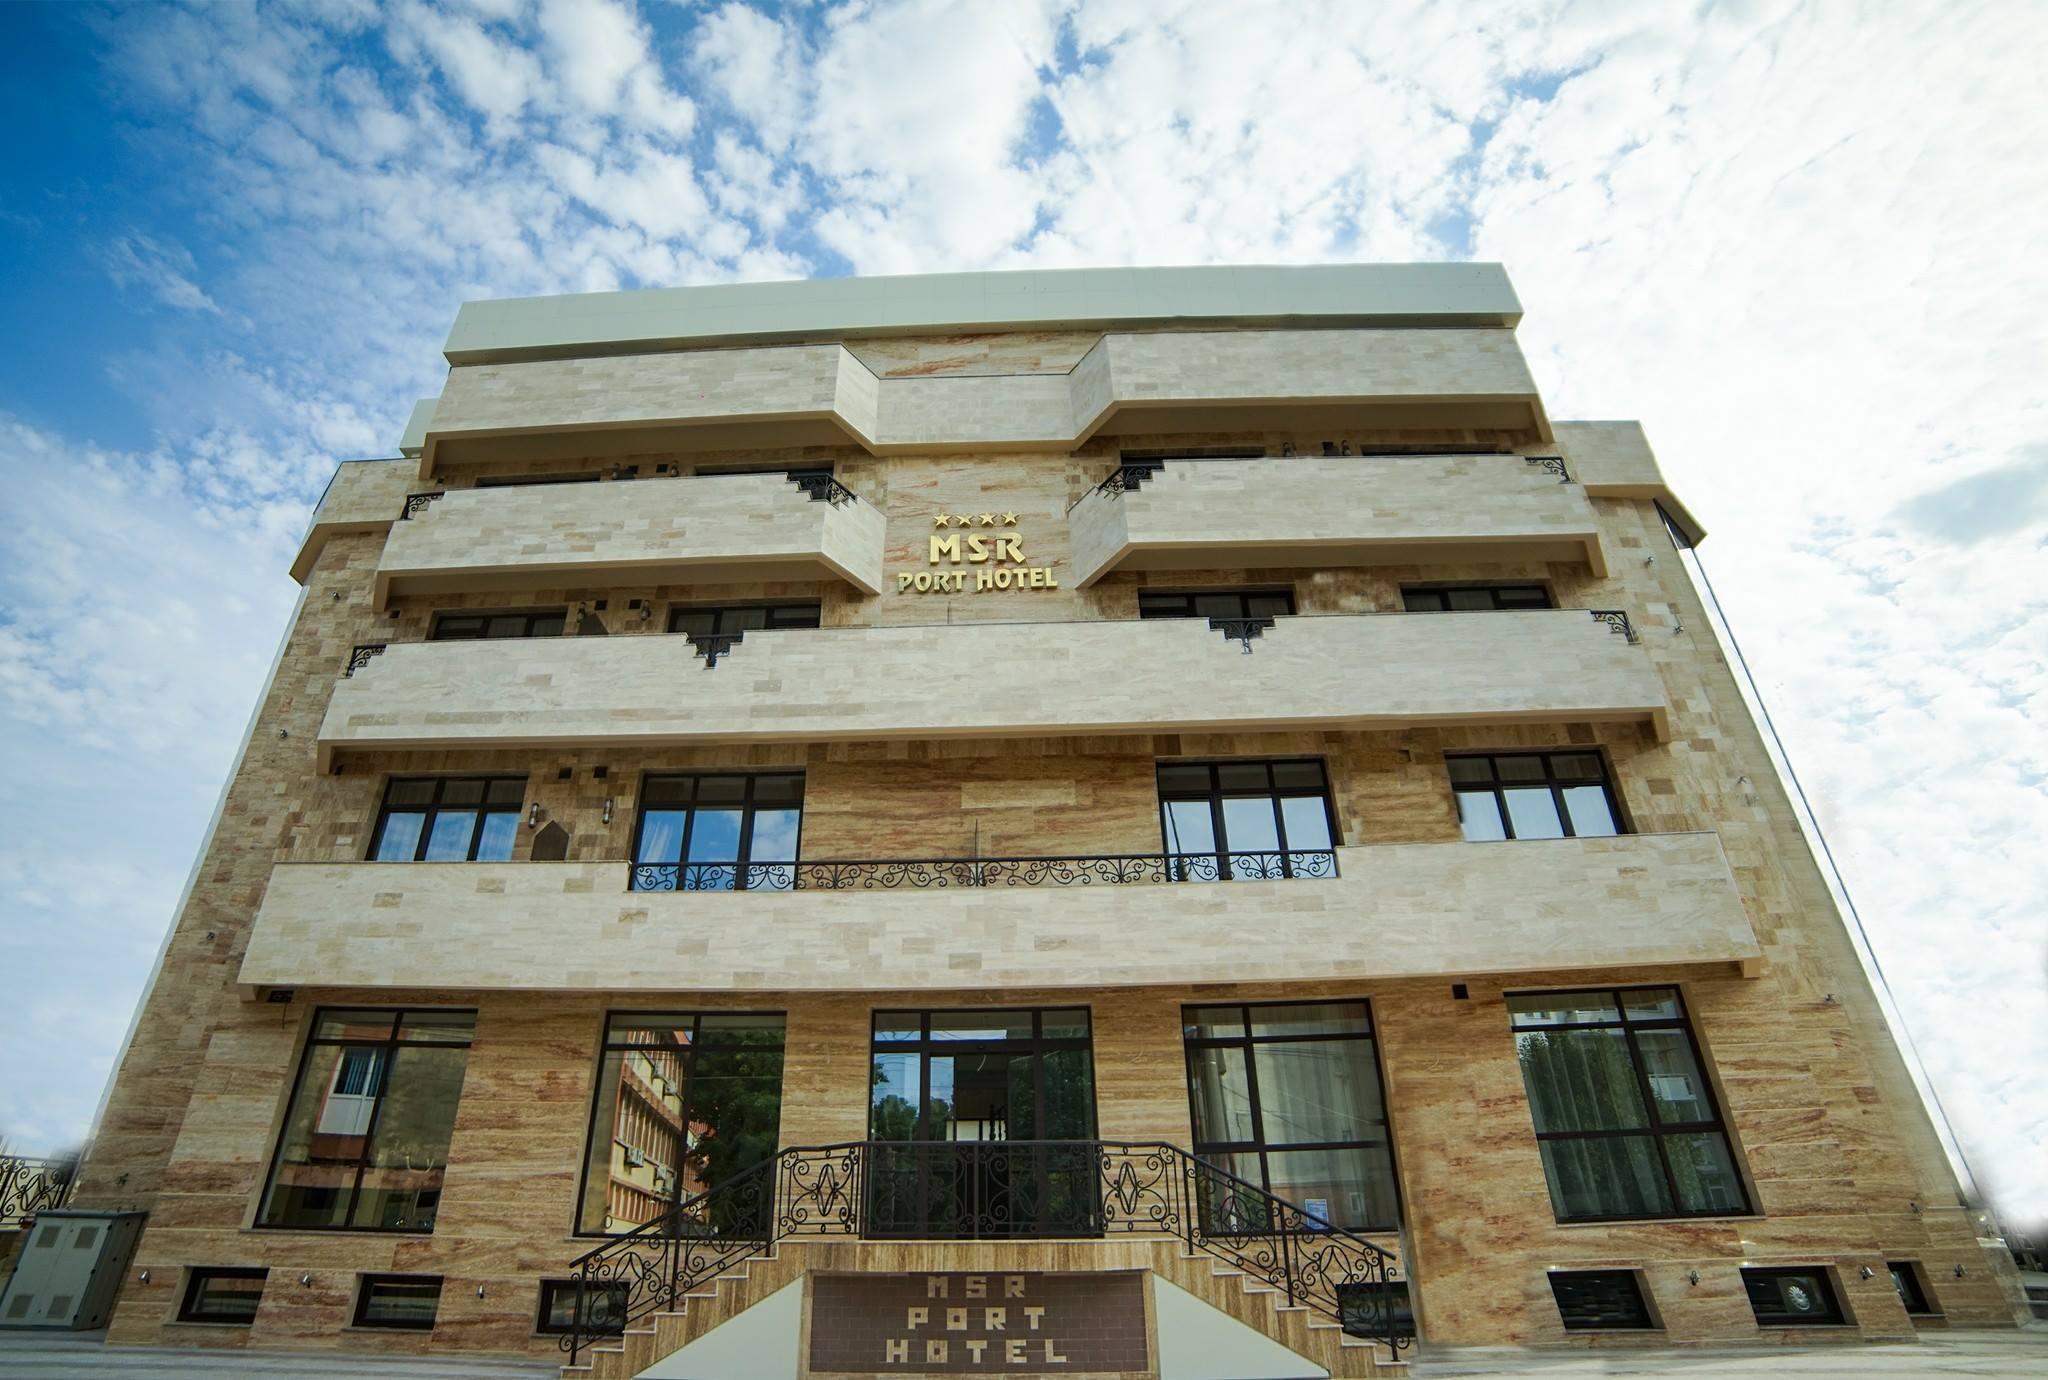 In curand msr port hotel 4 n mangalia promo galerie foto mangalia news - Hotel port salins 4 empuriabrava ...